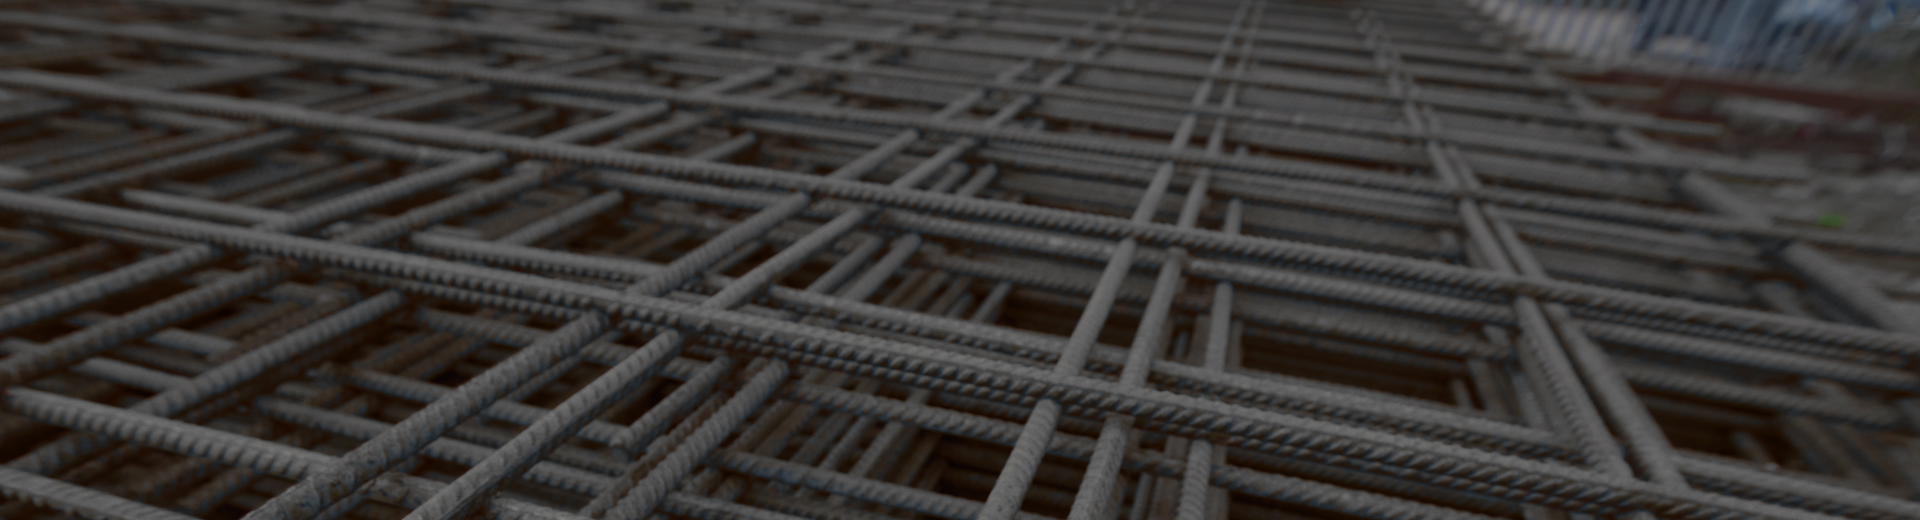 Reinforcing Steel Mesh Panels